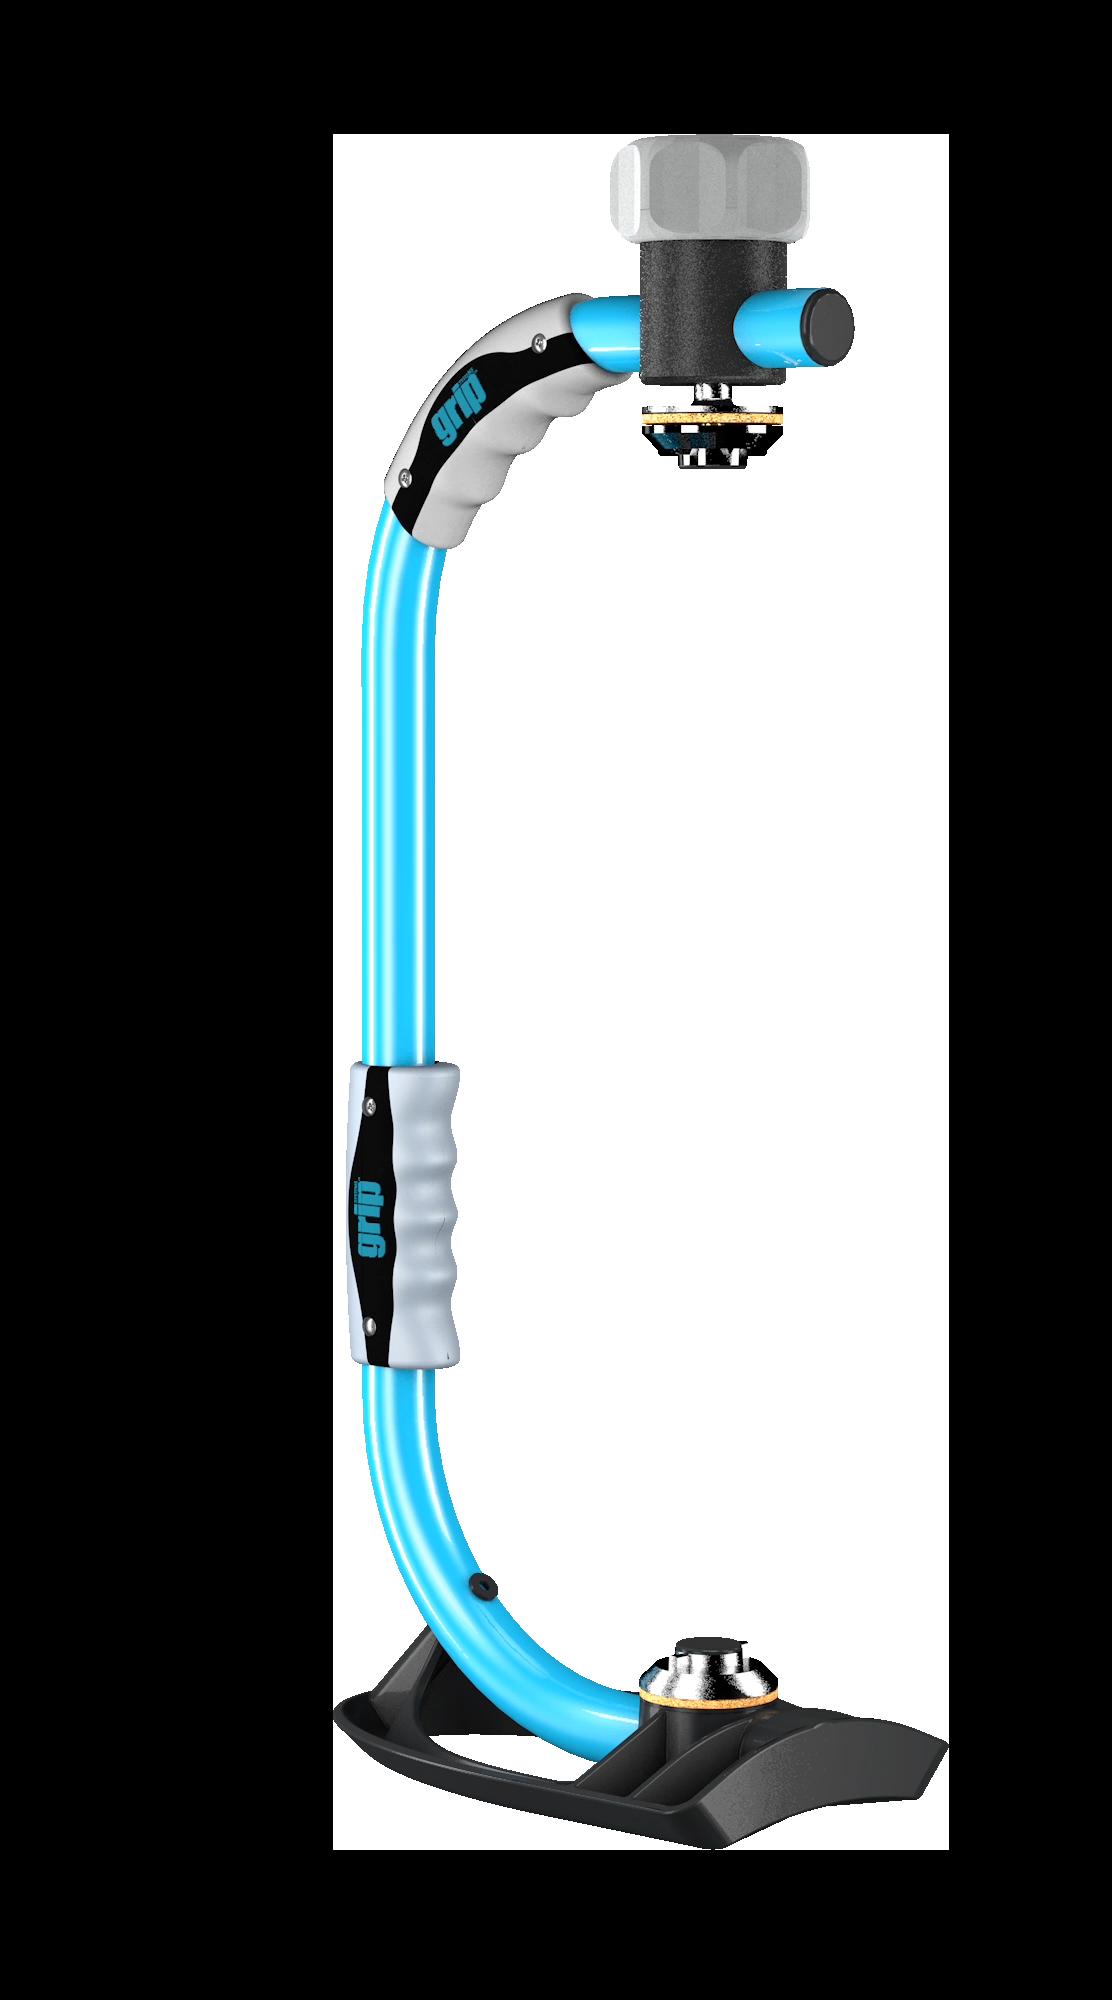 B-180608-grip-dispenser-main-hero